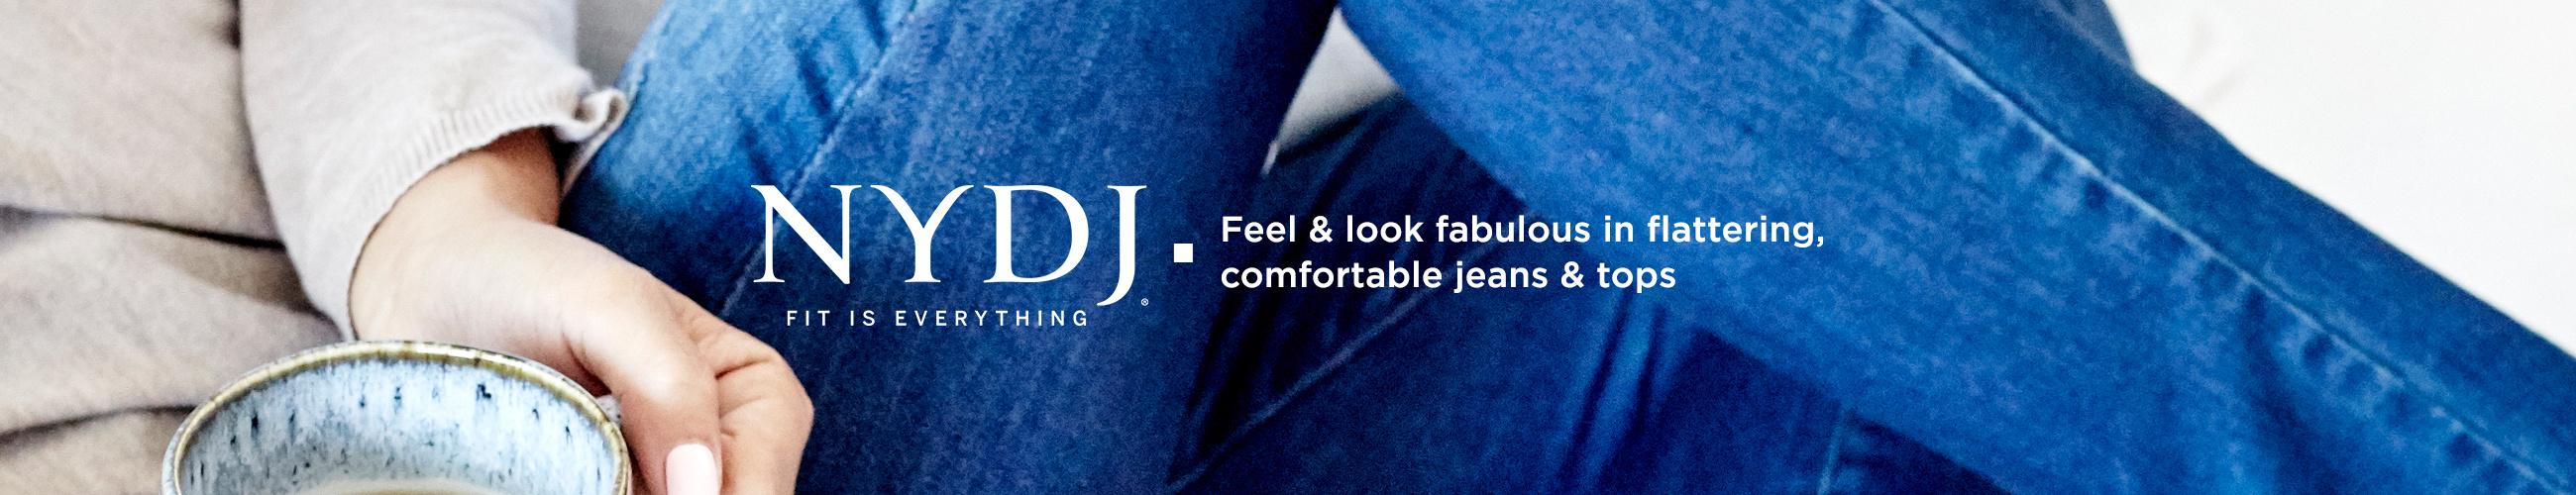 NYDJ  Feel & look fabulous in flattering, comfortable jeans & tops